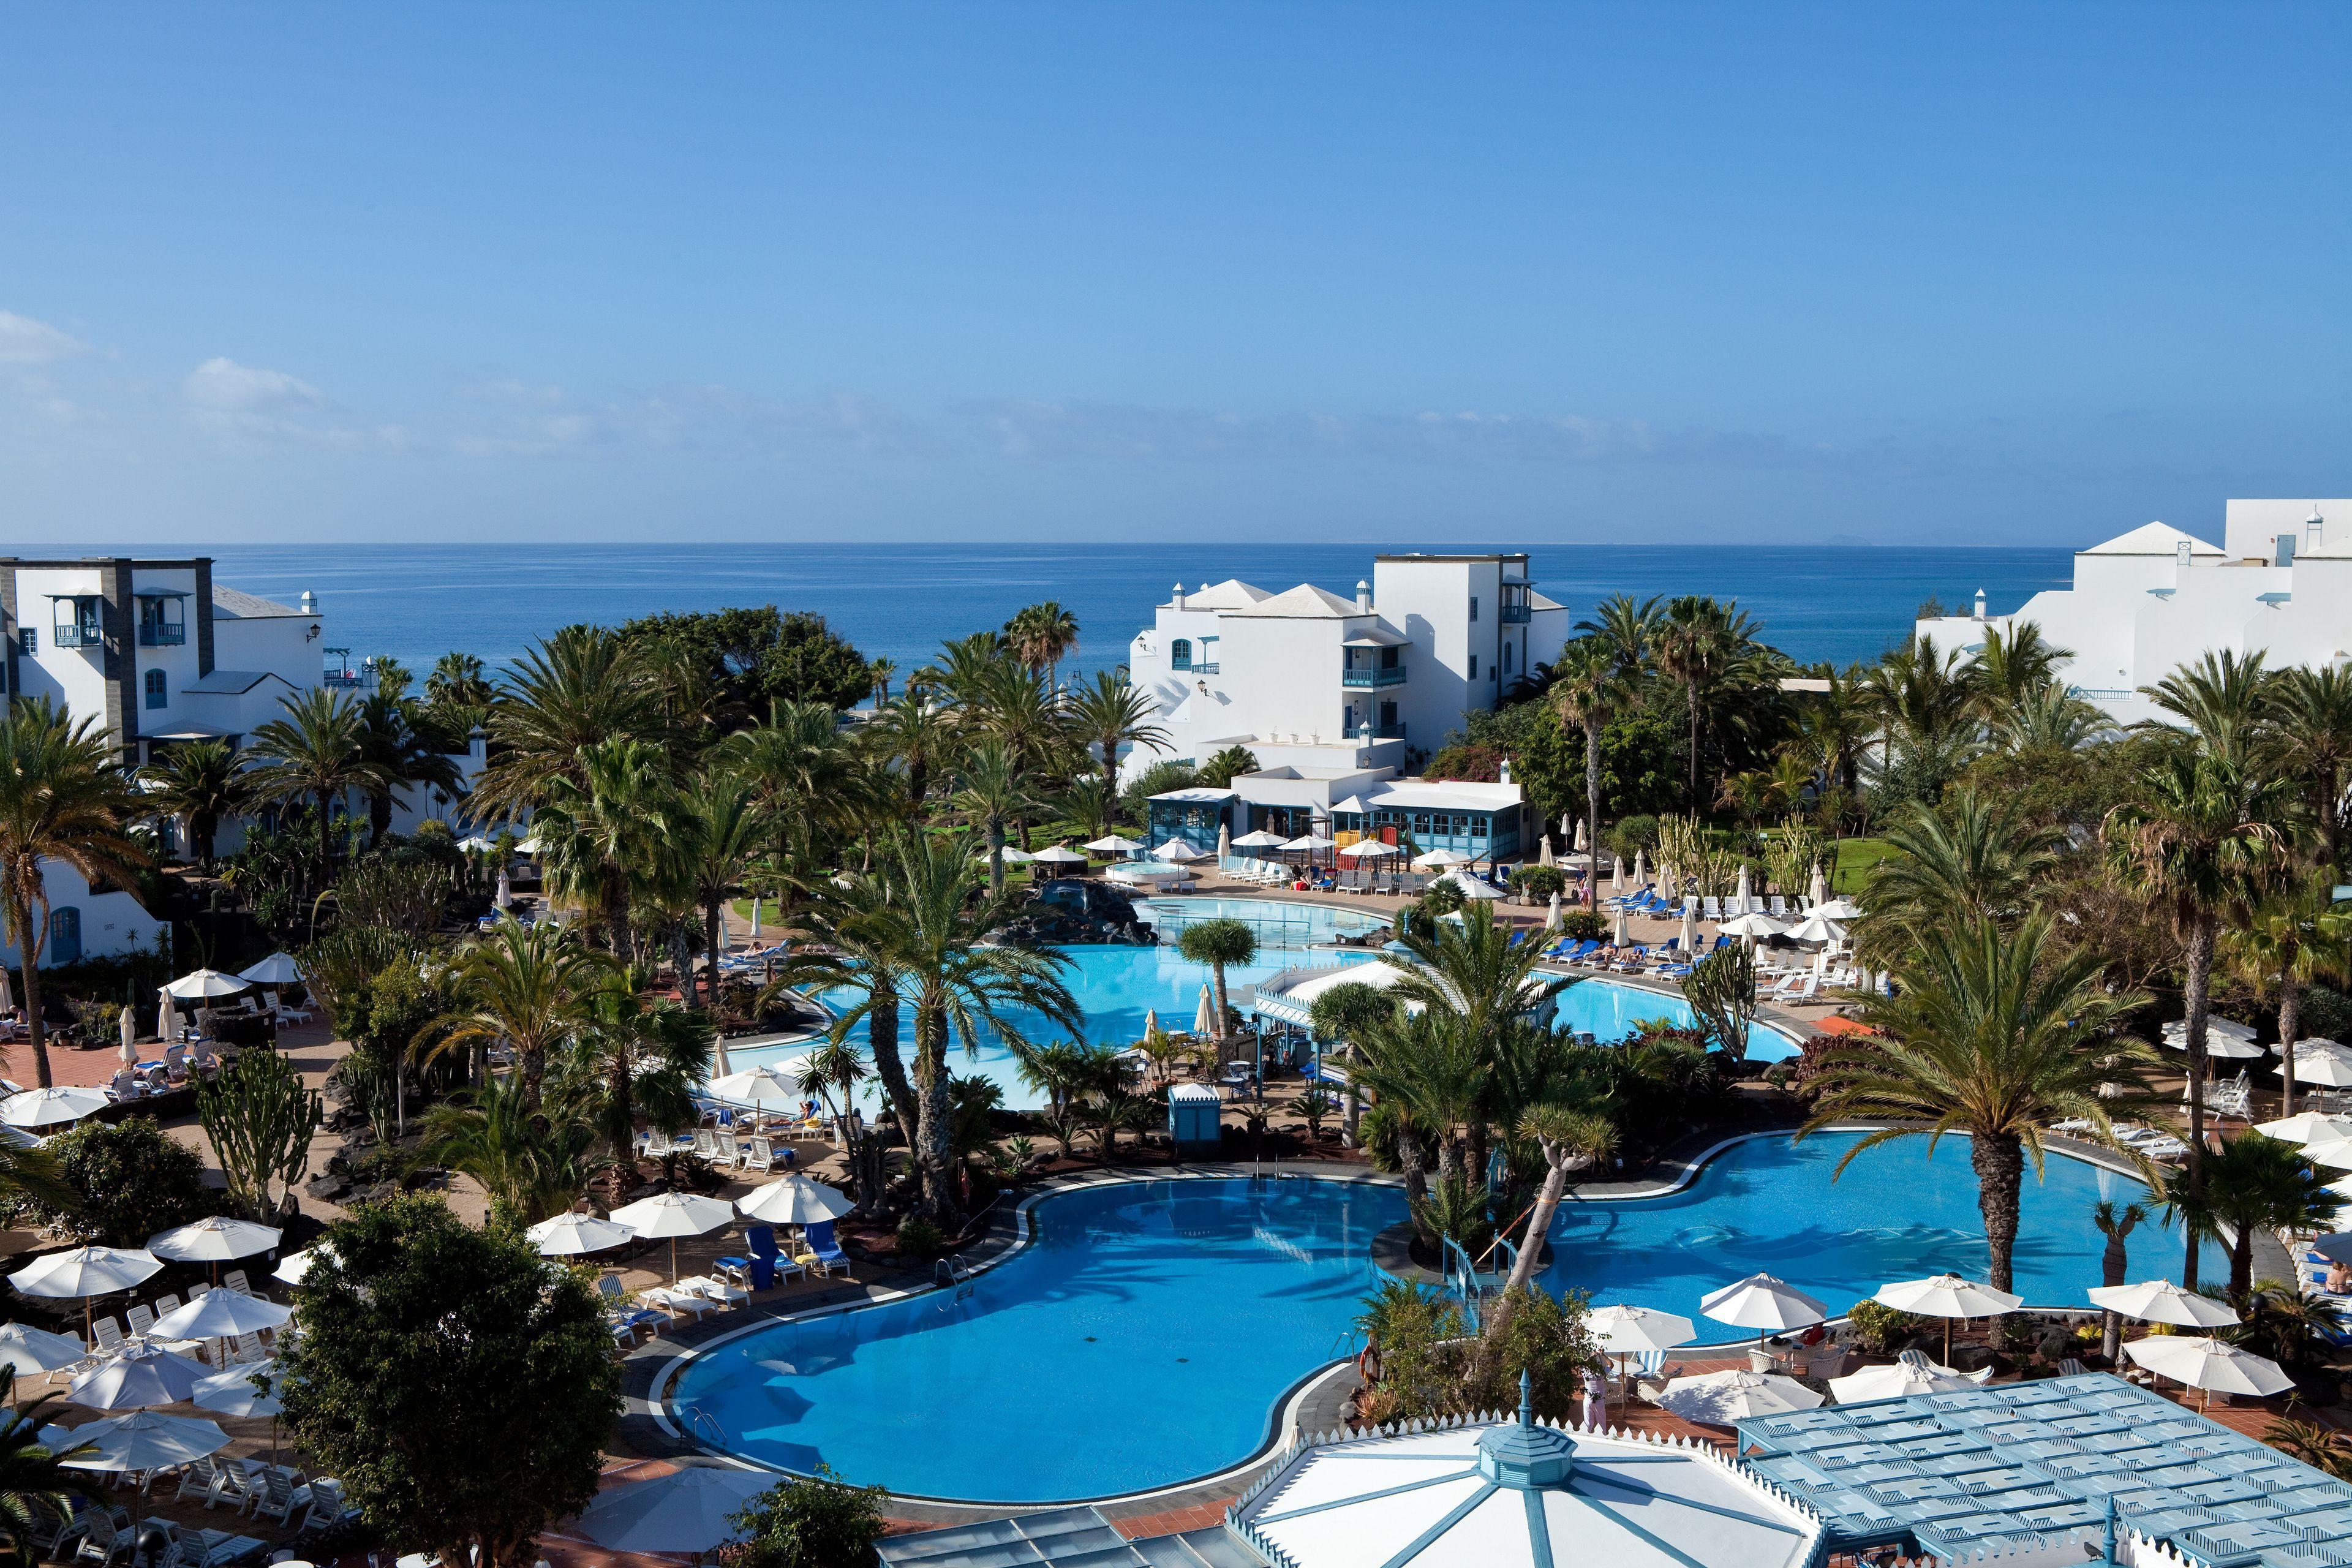 Courtesy of Seaside Los Jameos Playa / Expedia.com